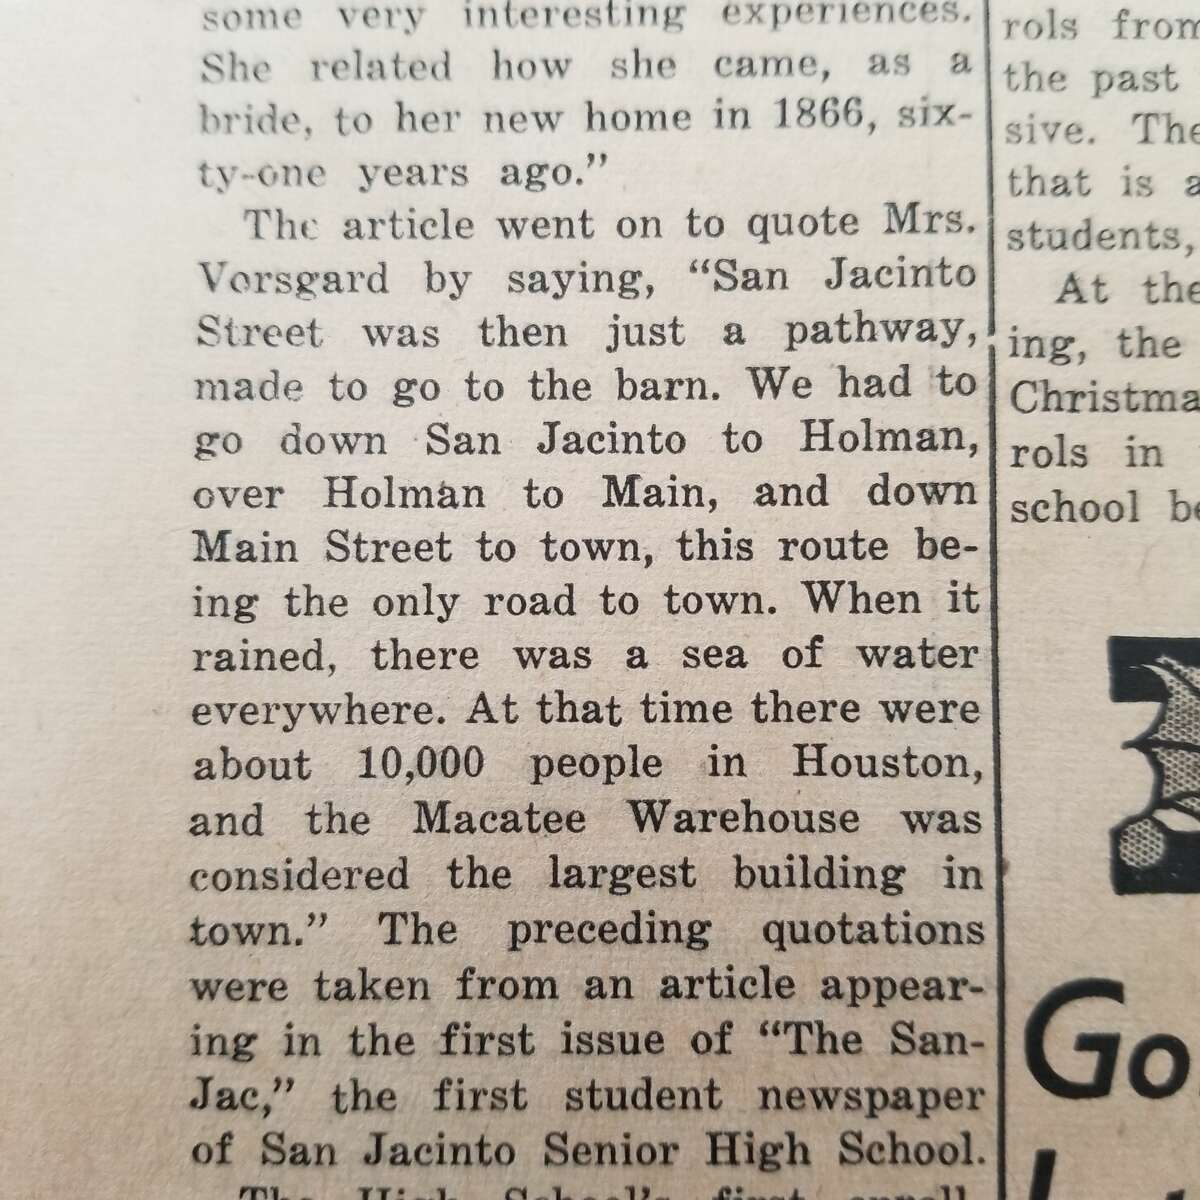 Excerpt from Dec. 20, 1946, San Jacinto Star, the student newspaper of San Jacinto High School.